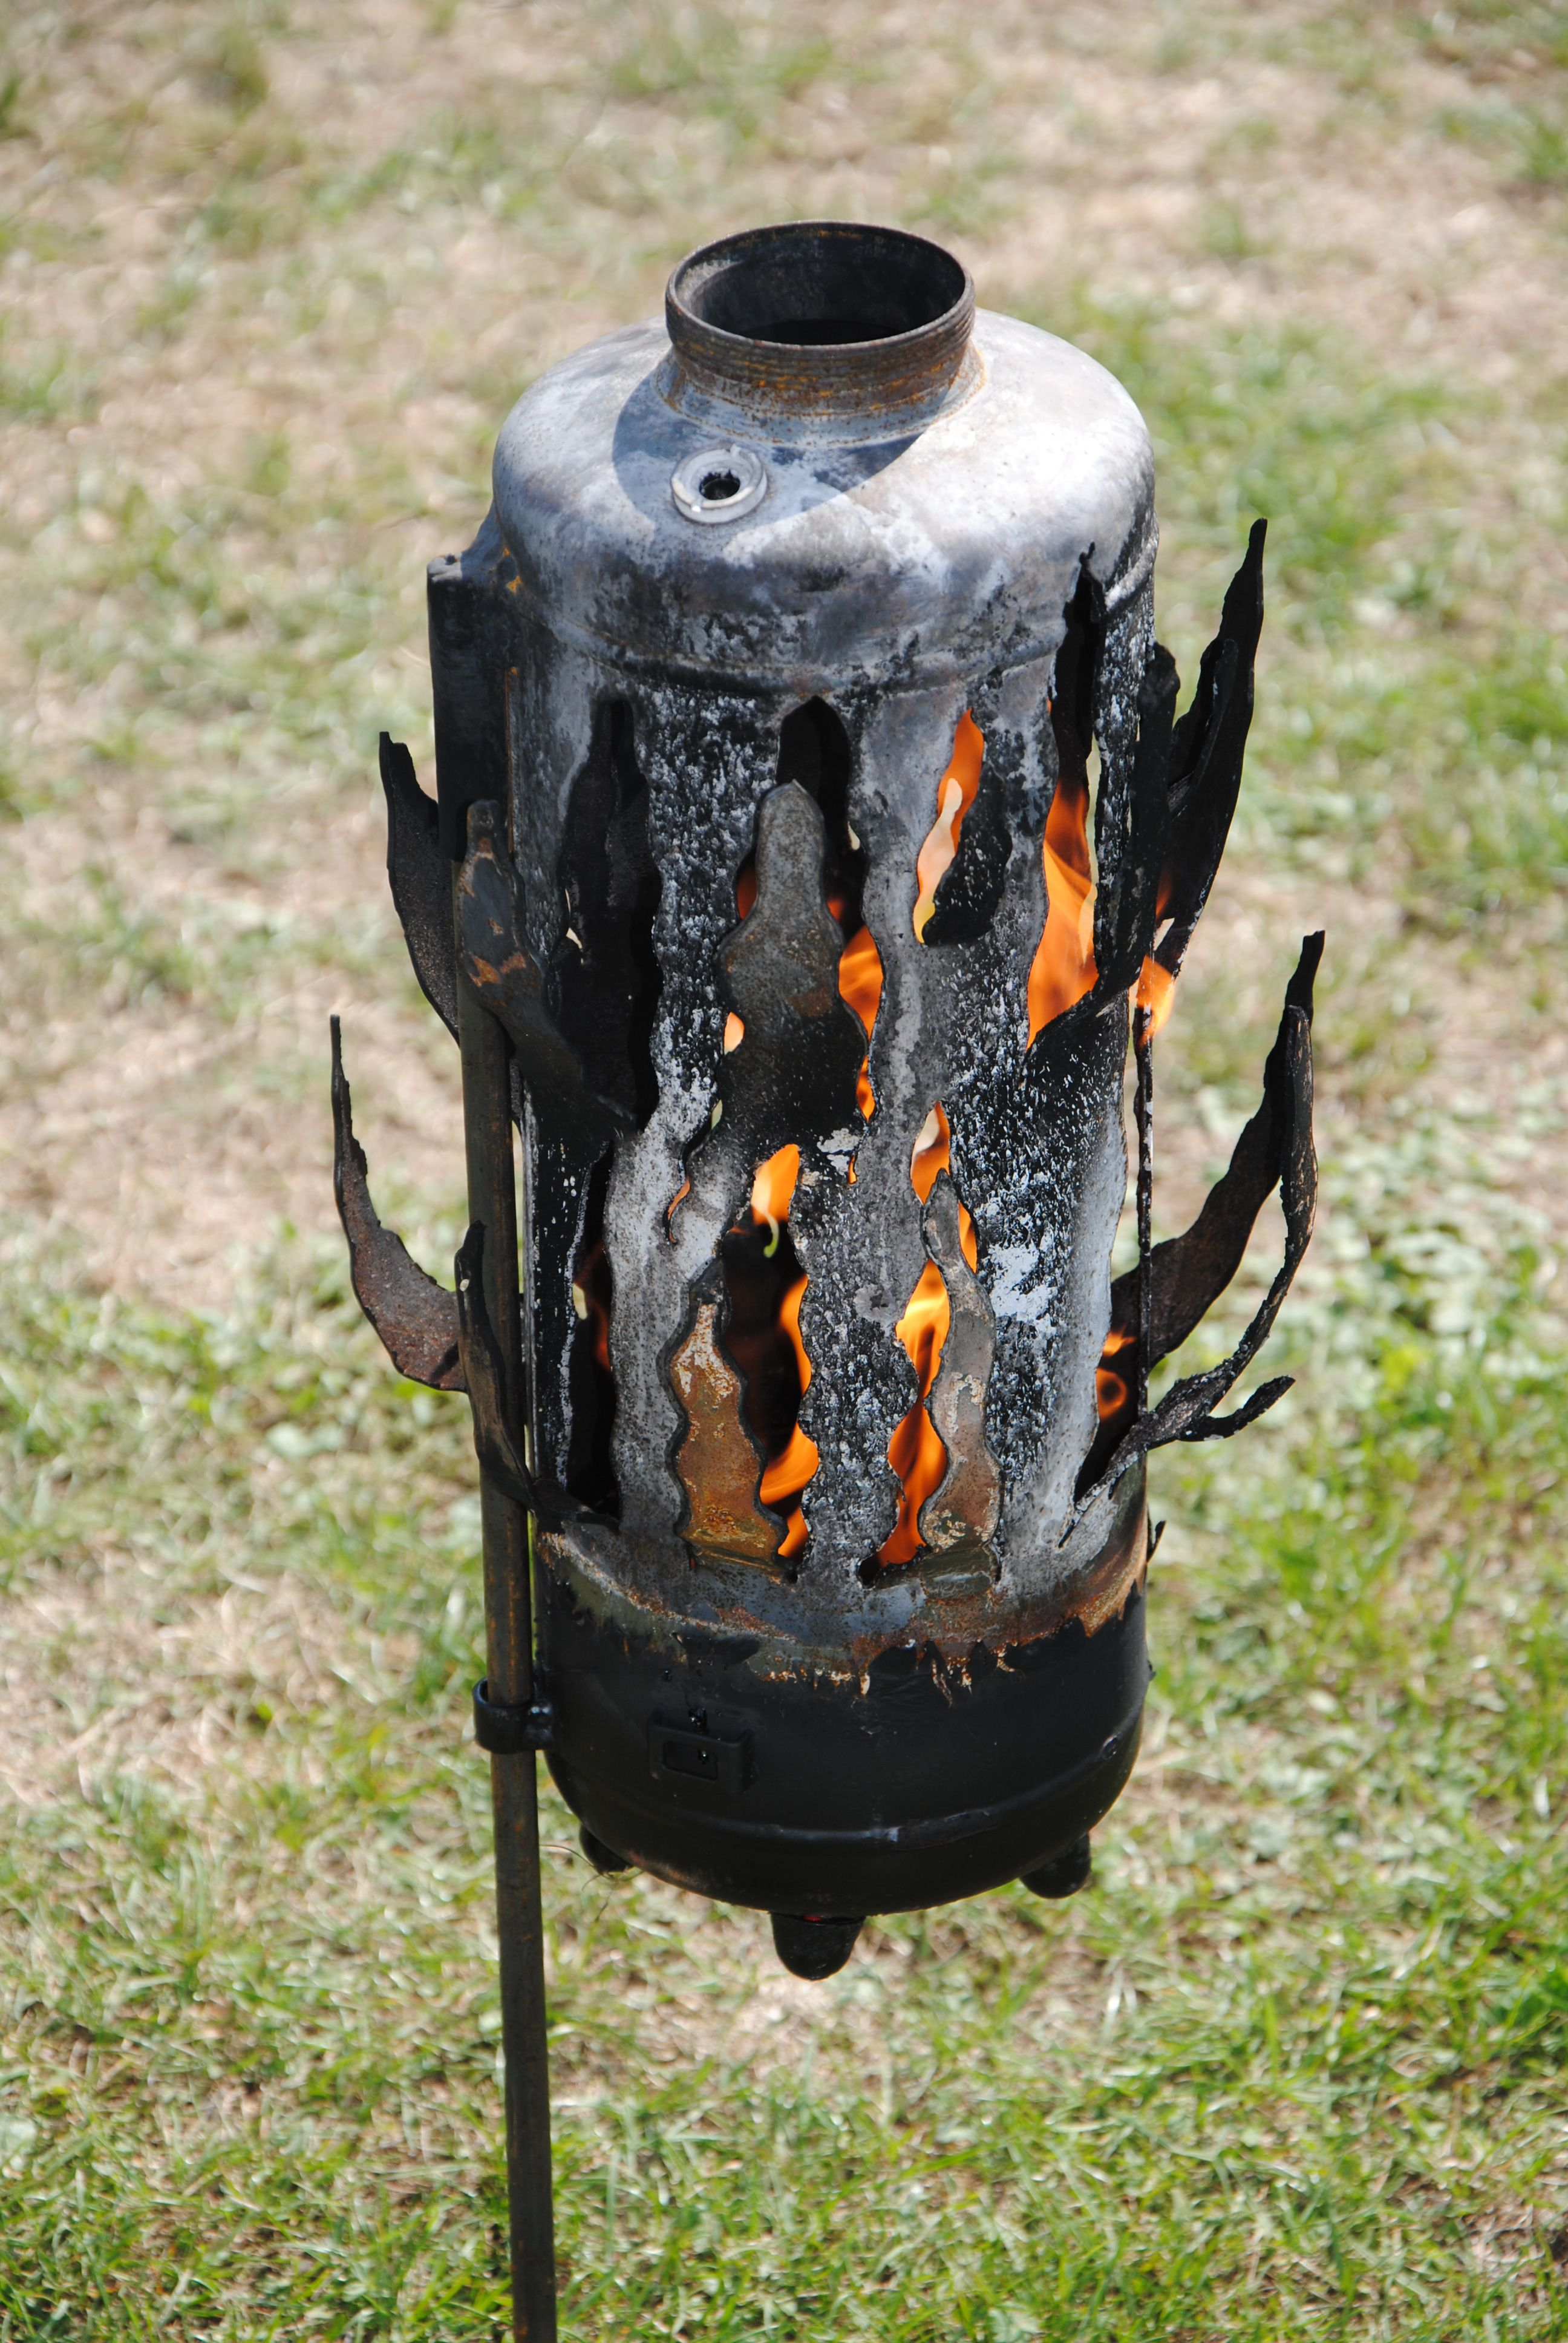 Gartendekoration gartenfackel feuer metall kunst feuer flammen und dekoration - Gartendekoration metall ...